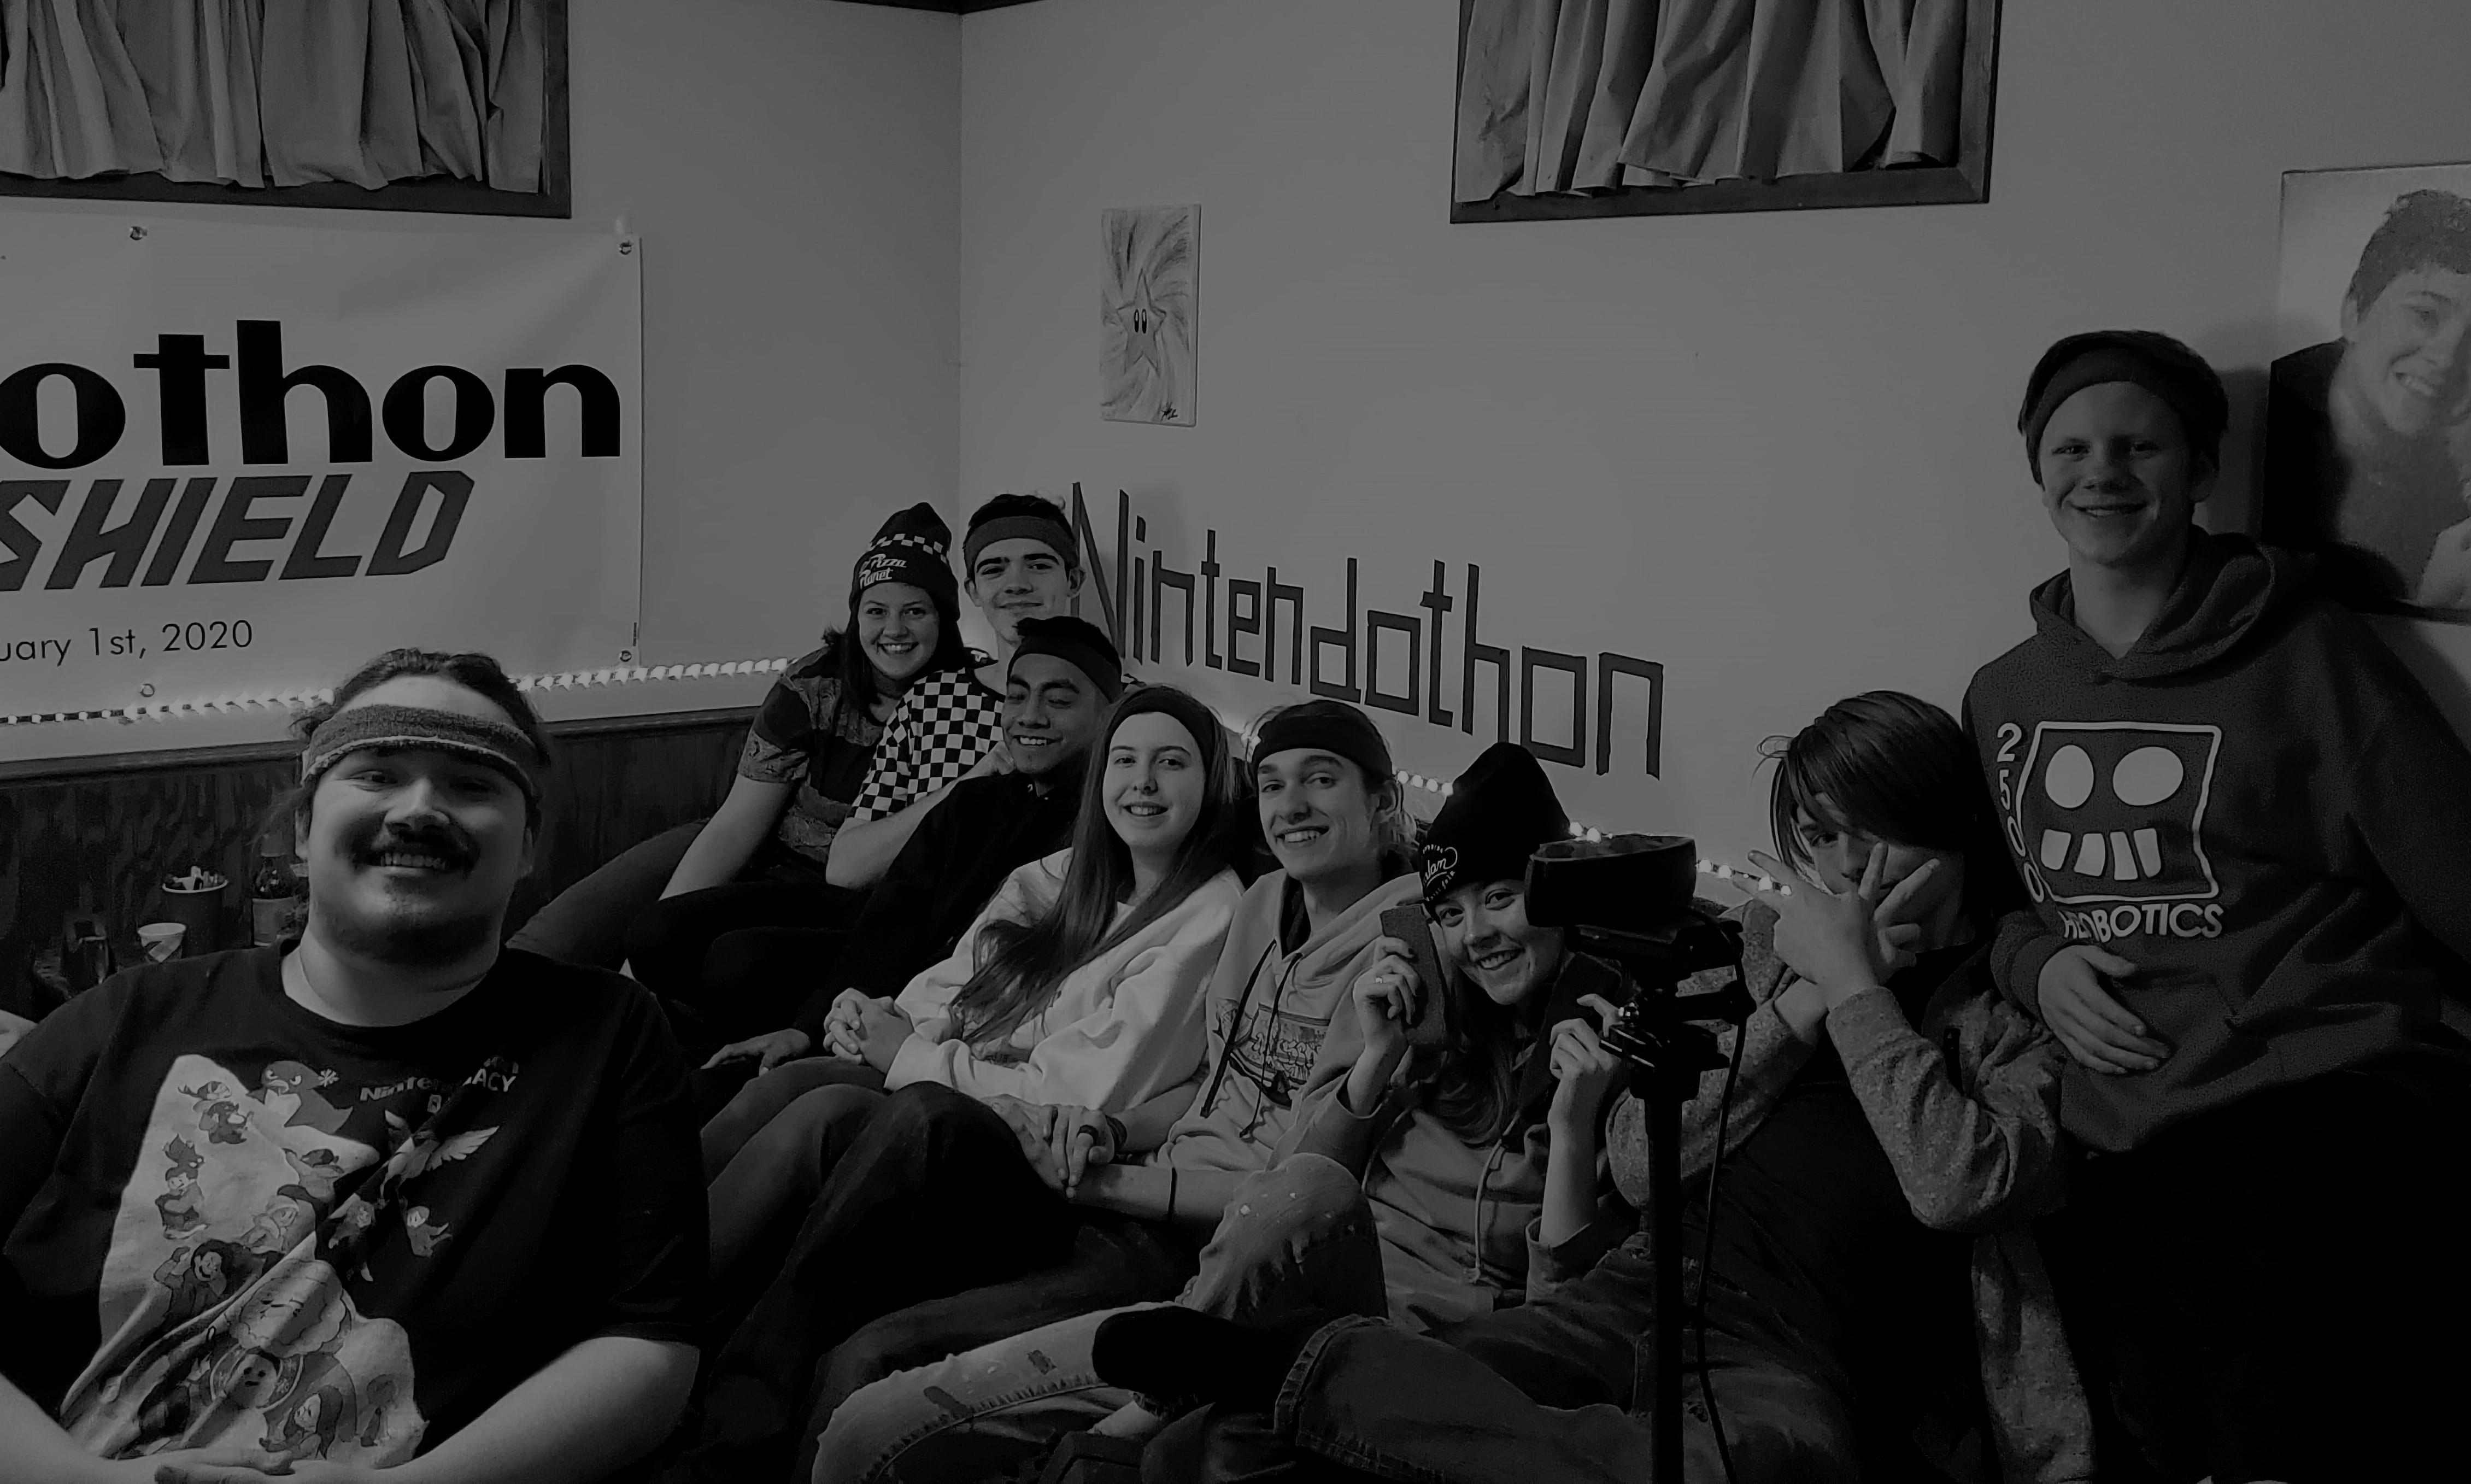 Nintendothon